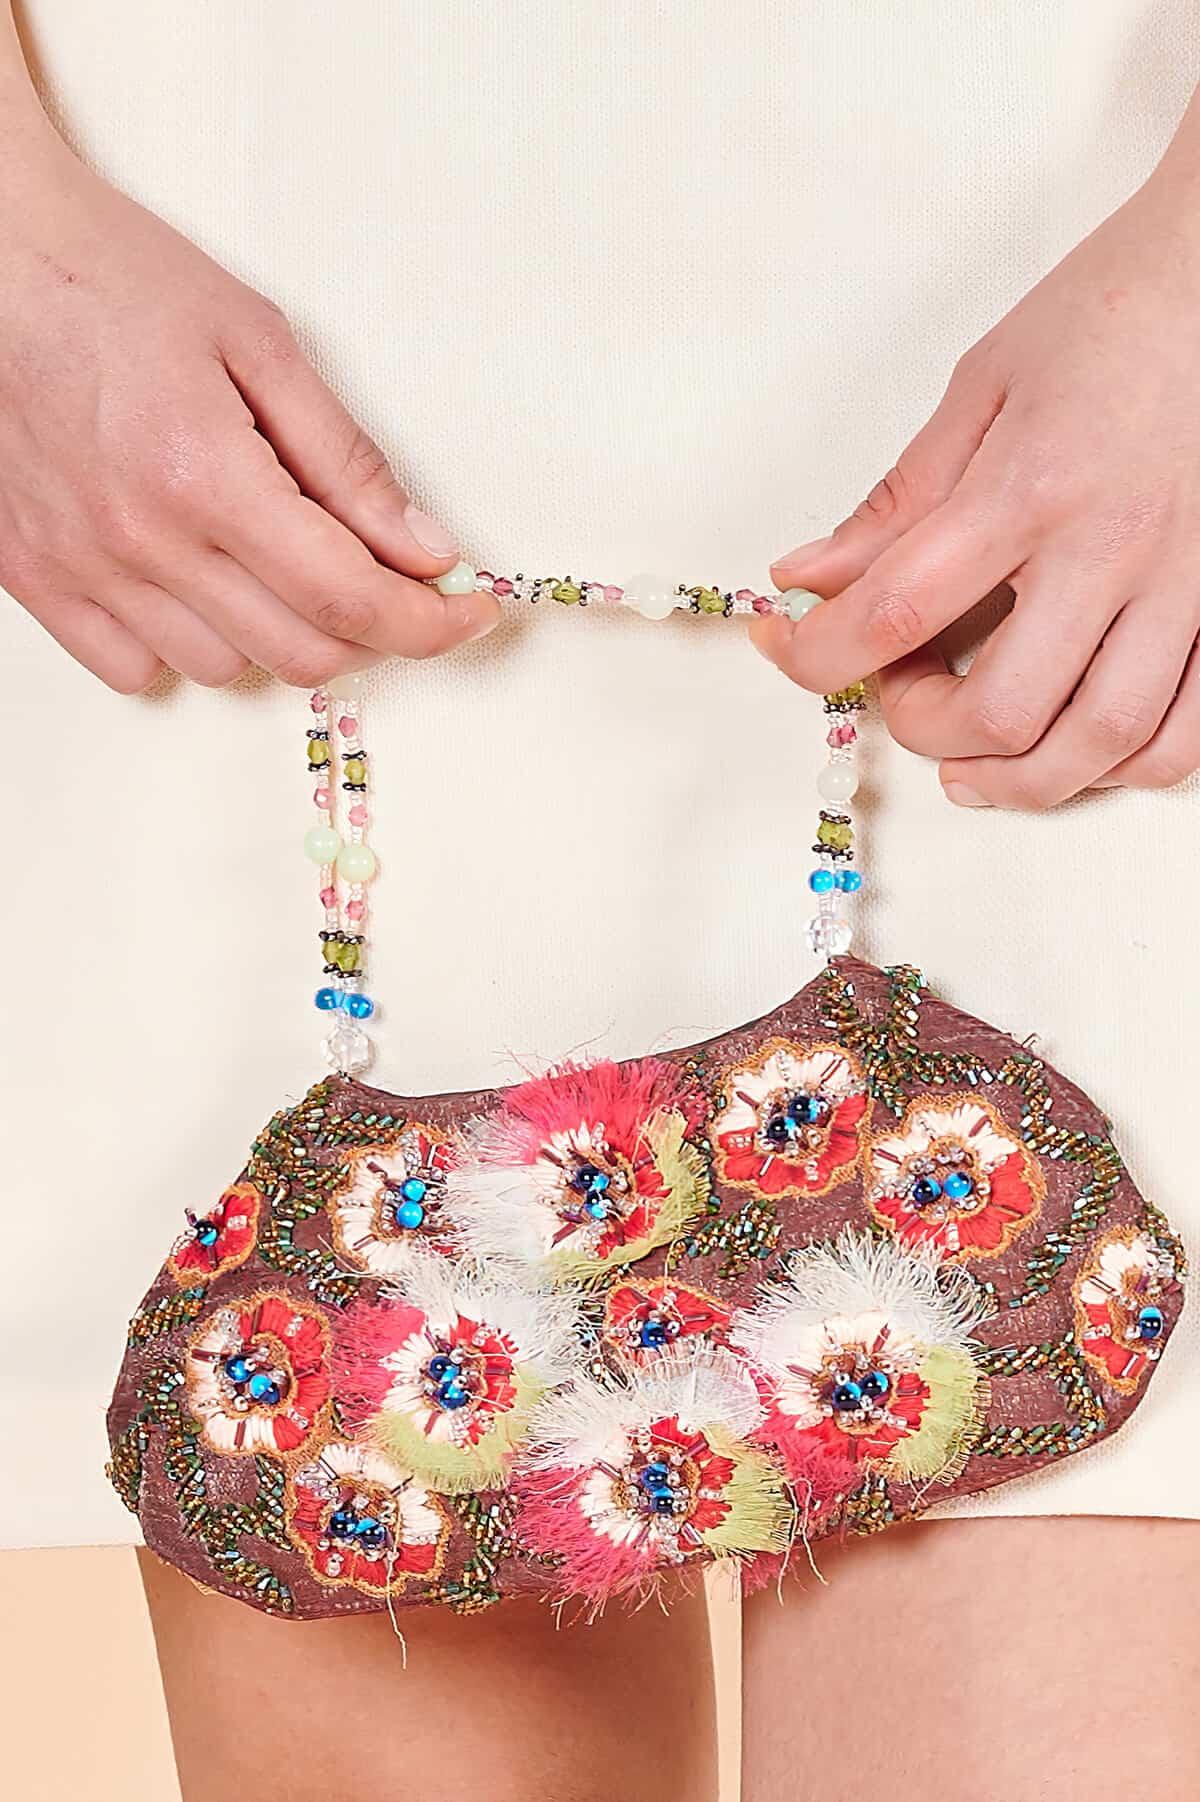 Boncuk saplı 90lar küçük el çantası